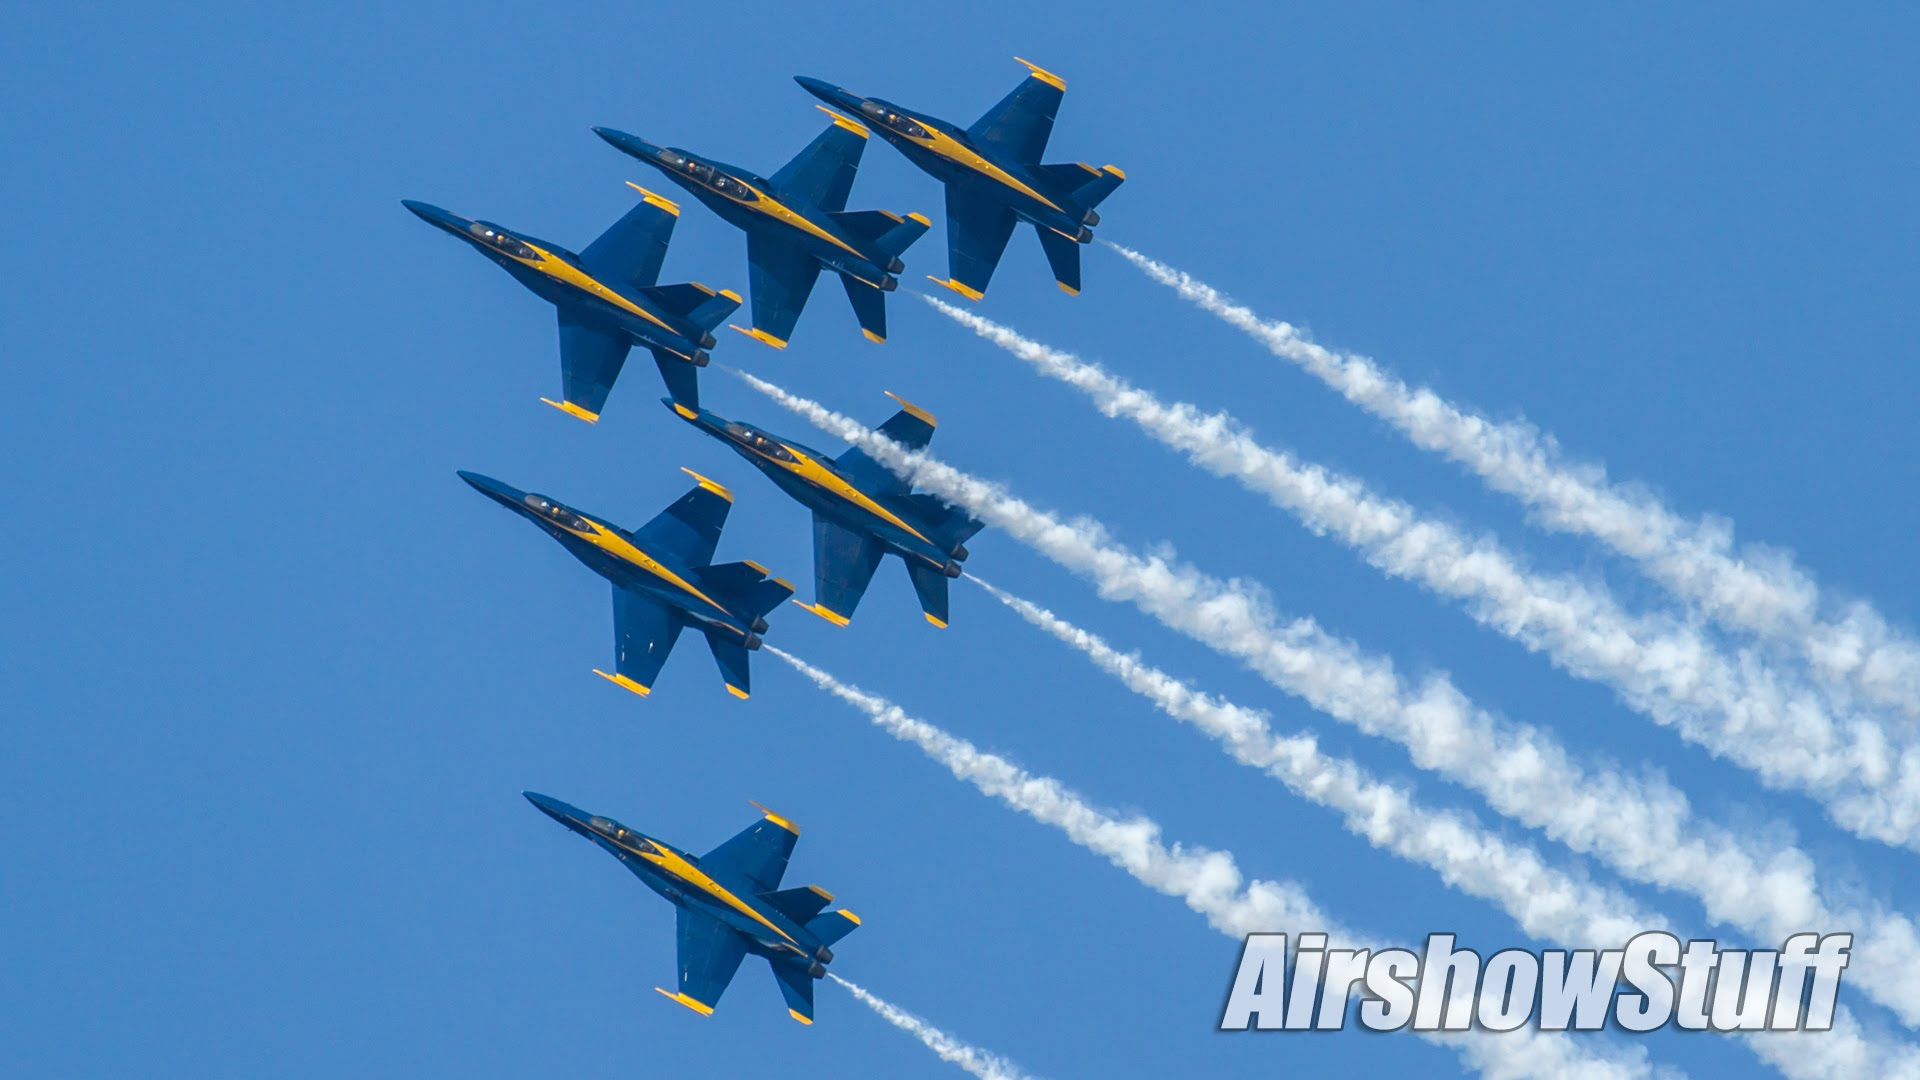 Us navy airshow photo